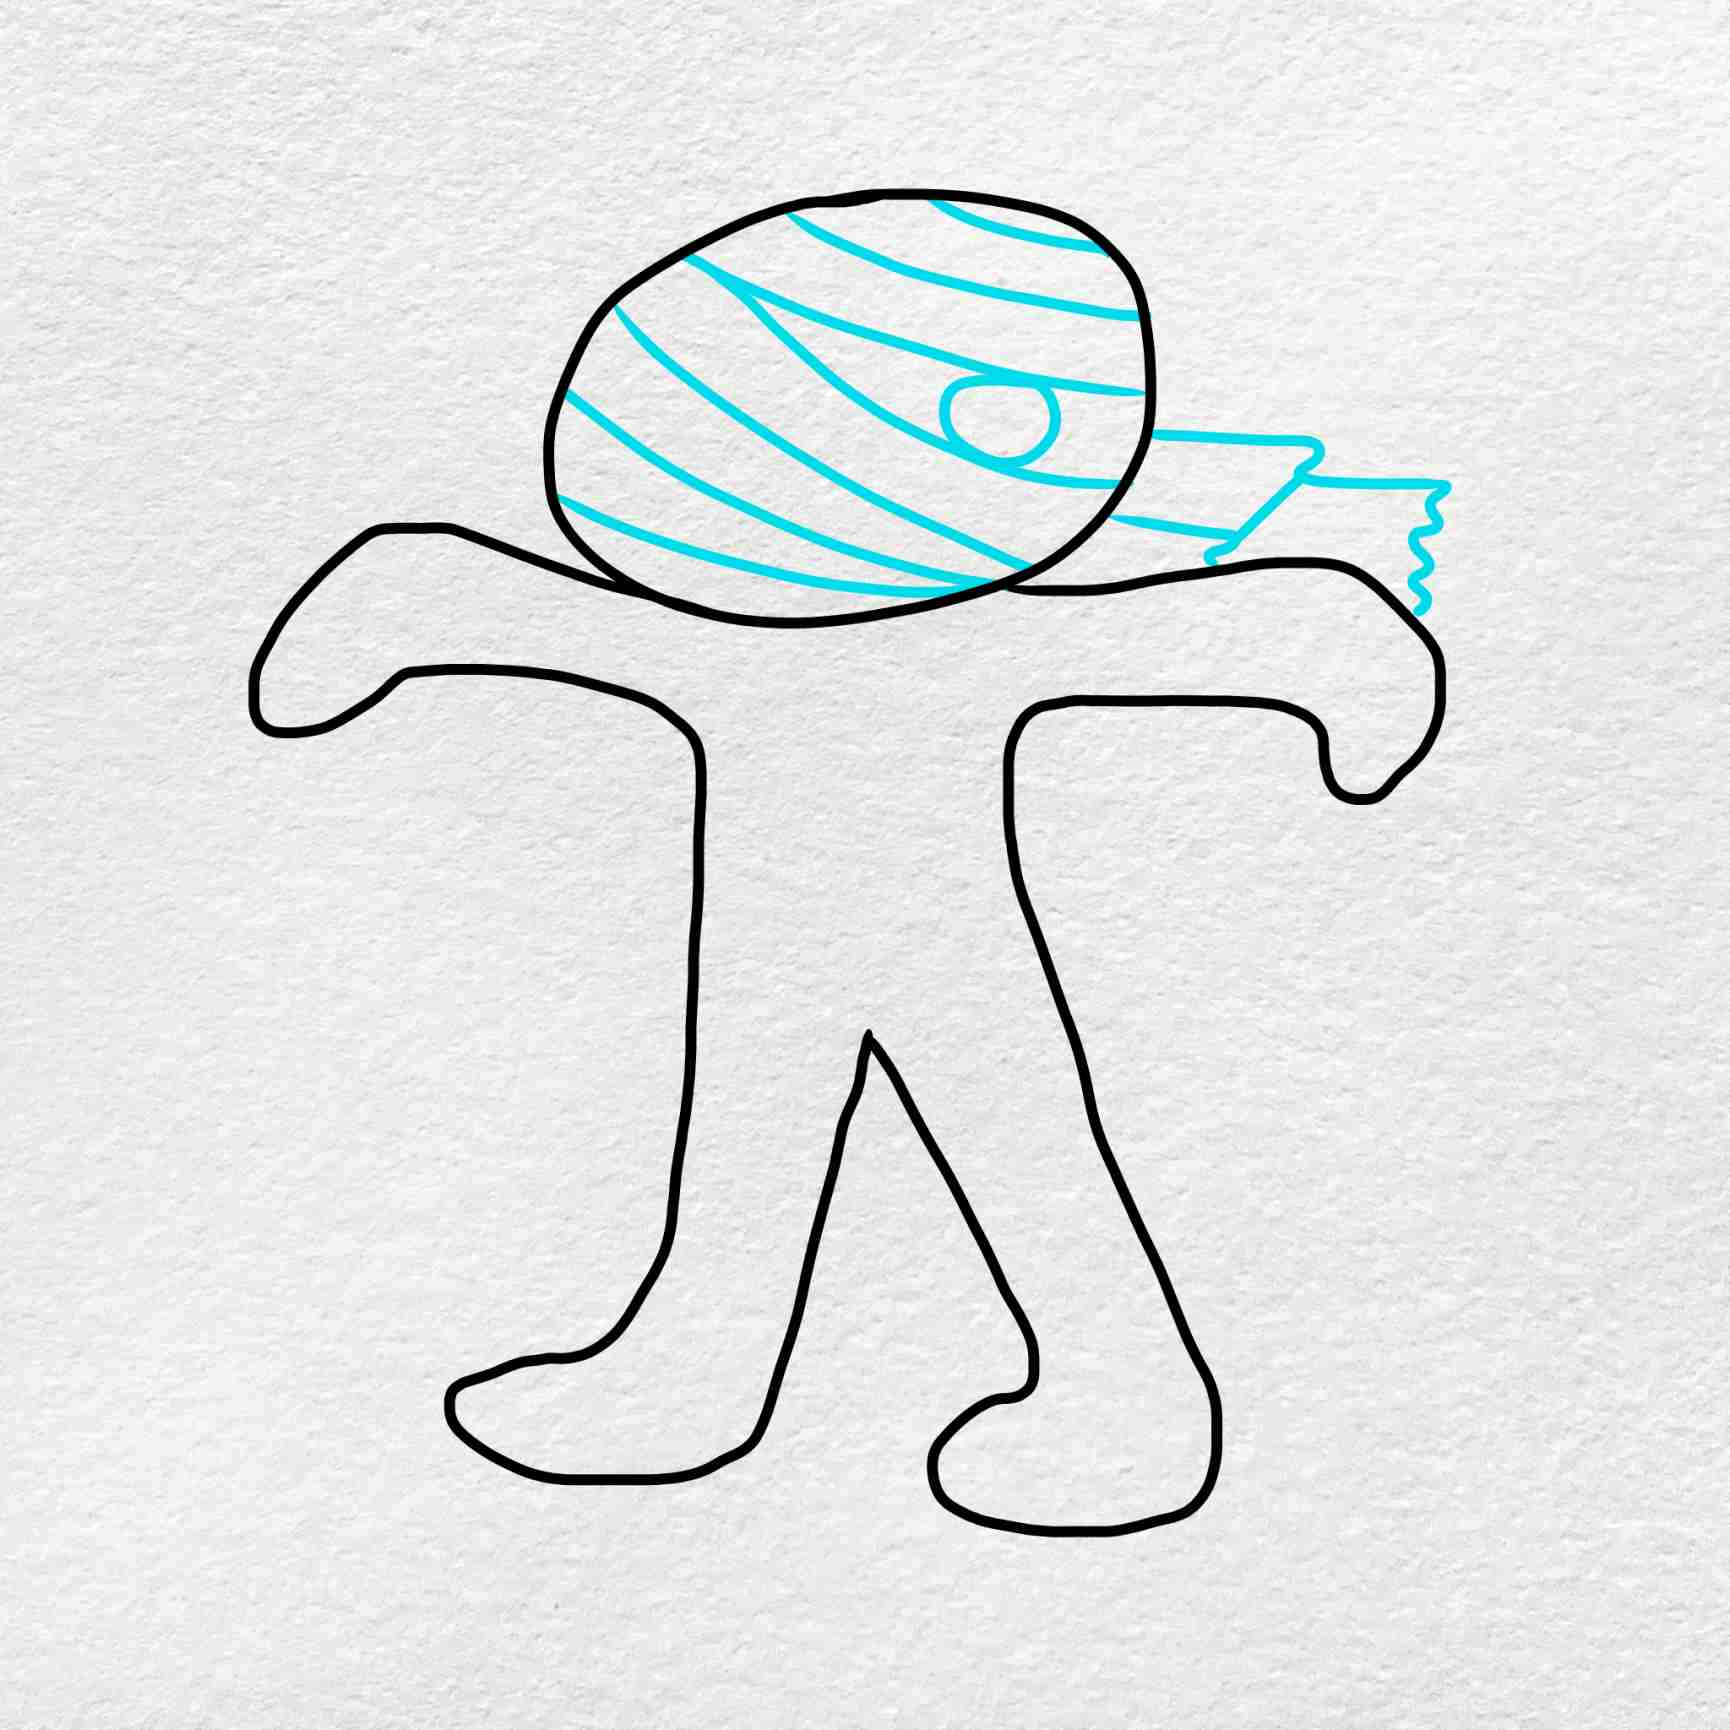 Mummy Drawing: Step 3